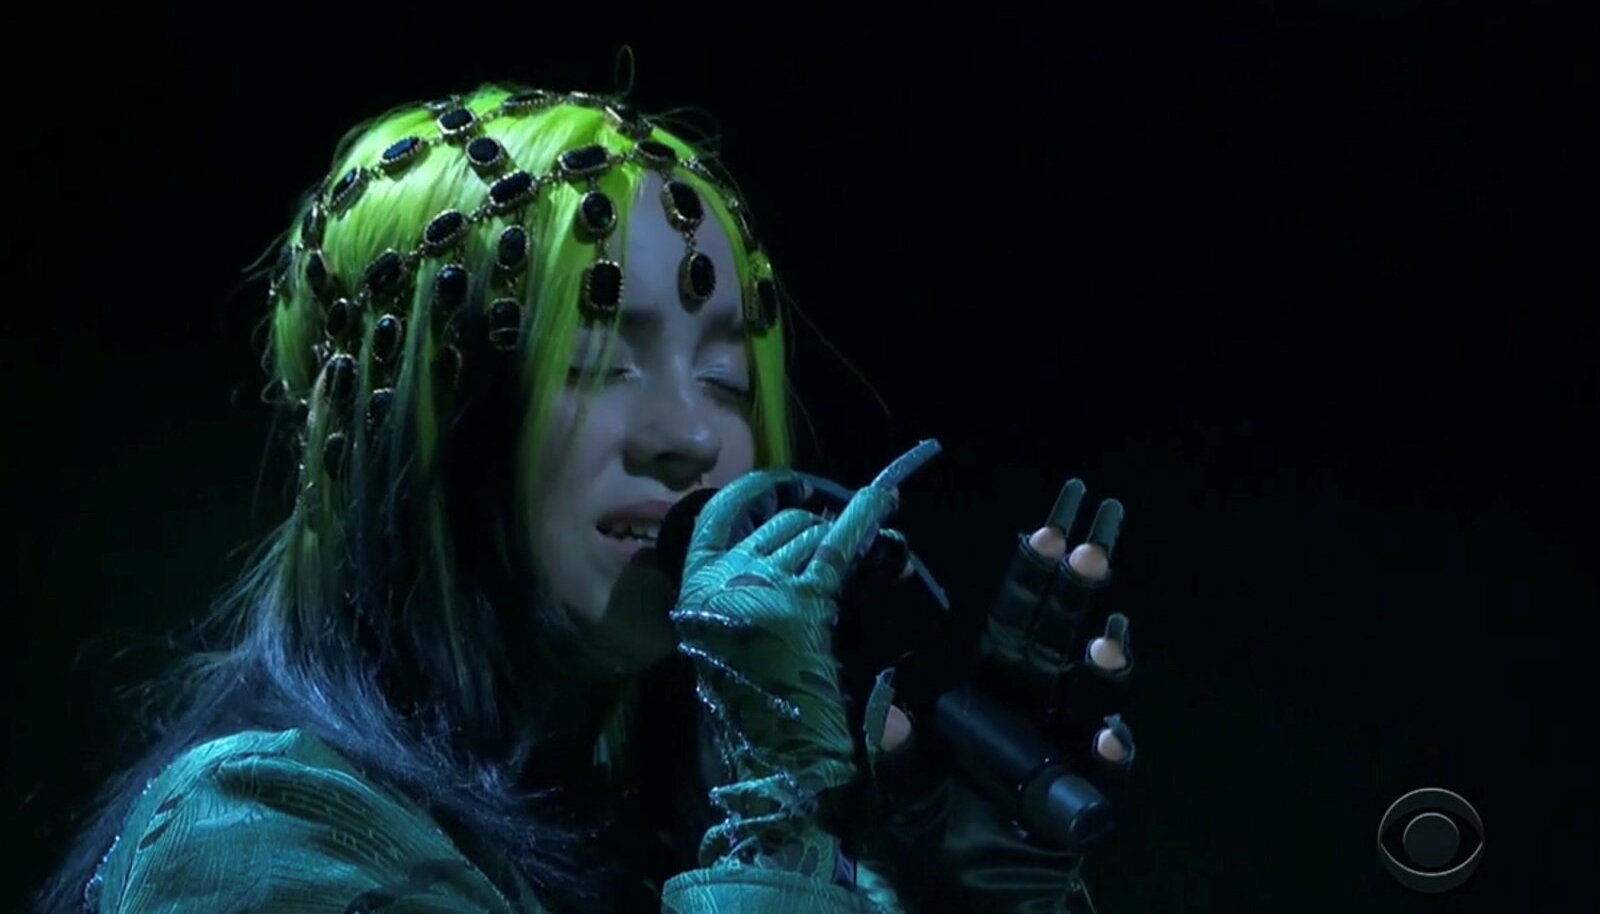 Billie Eilish märtsi keskel Grammyde tseremoonial esinemas